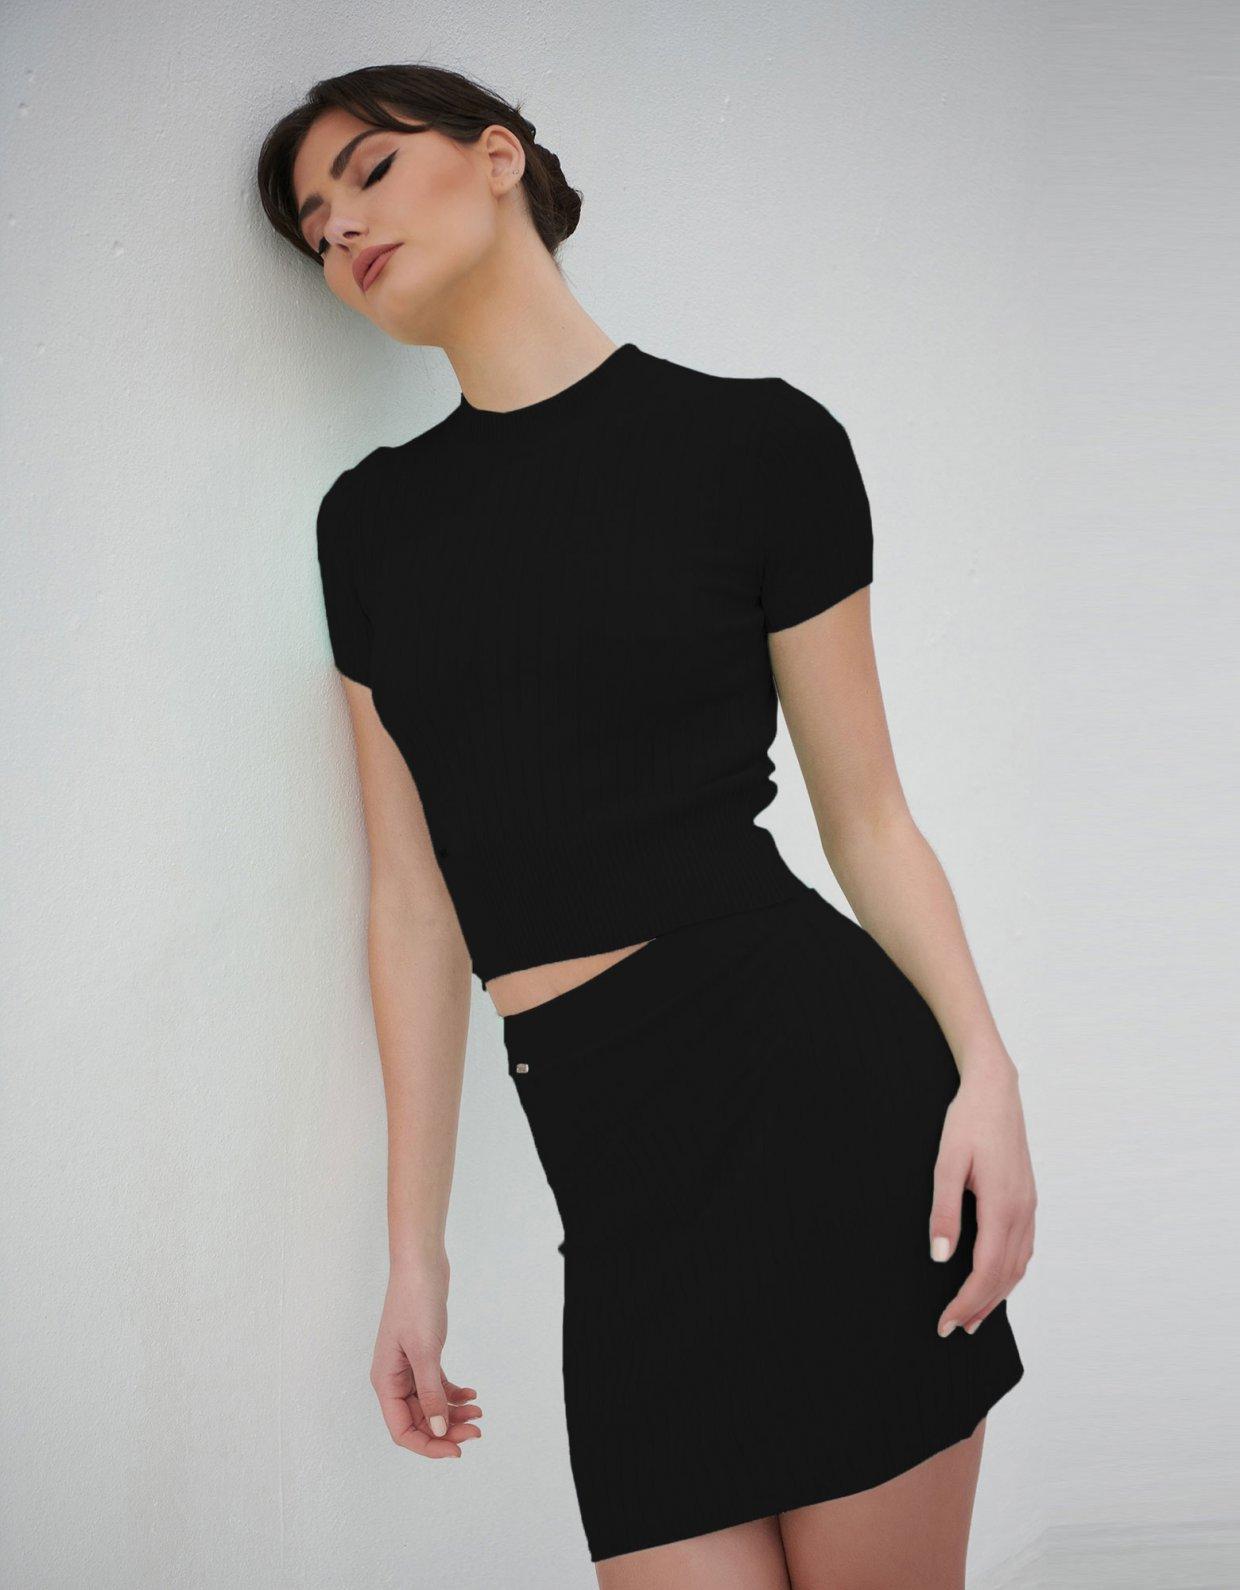 Combos Knitwear Combos S17 – Black set